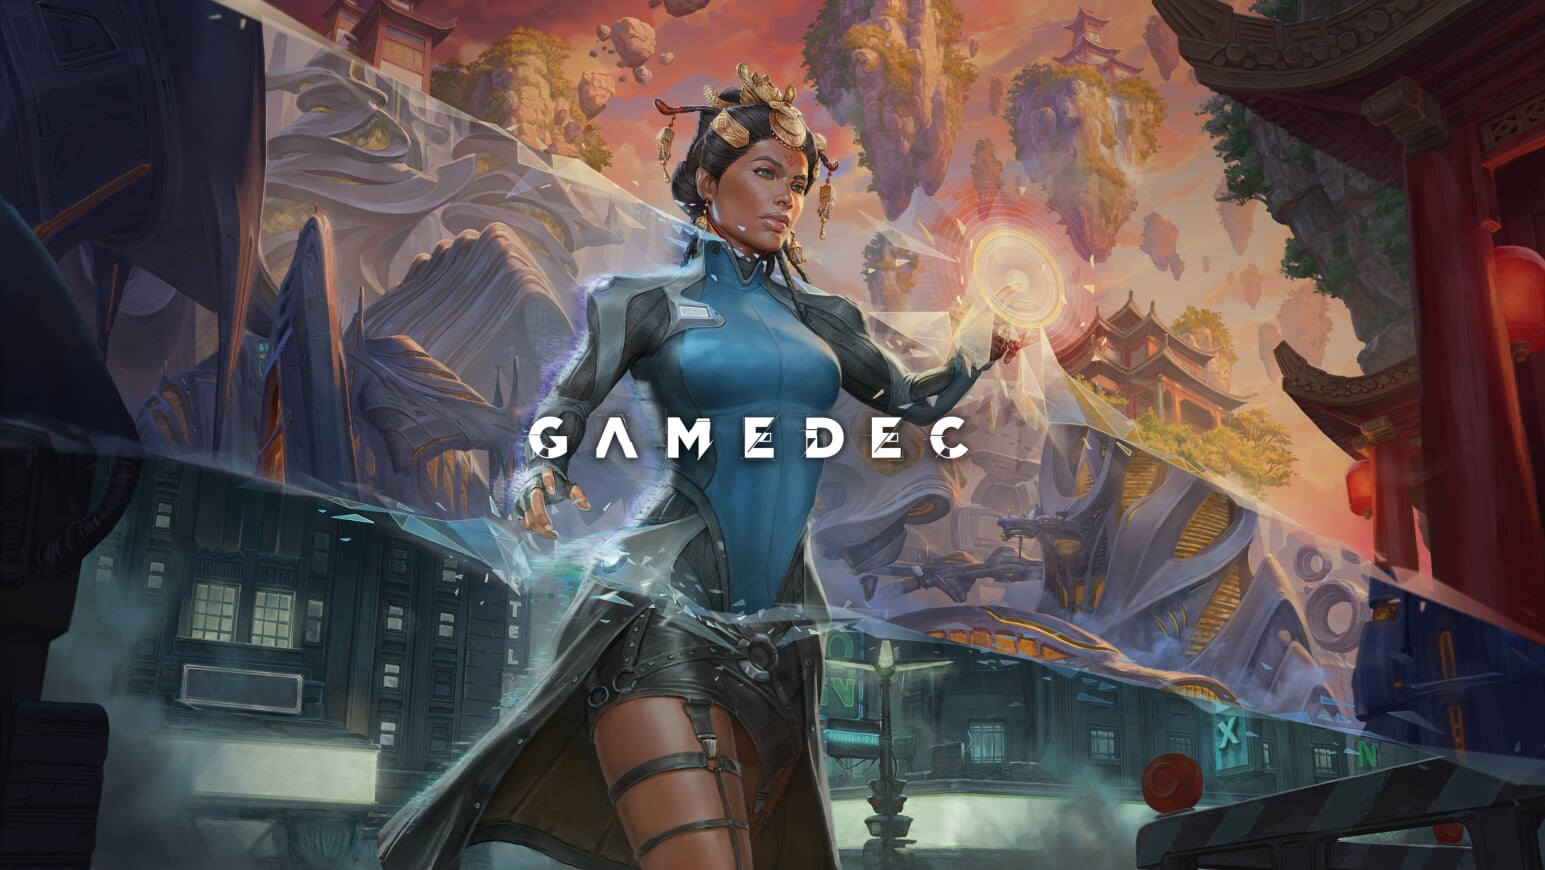 Gamedec Promoart